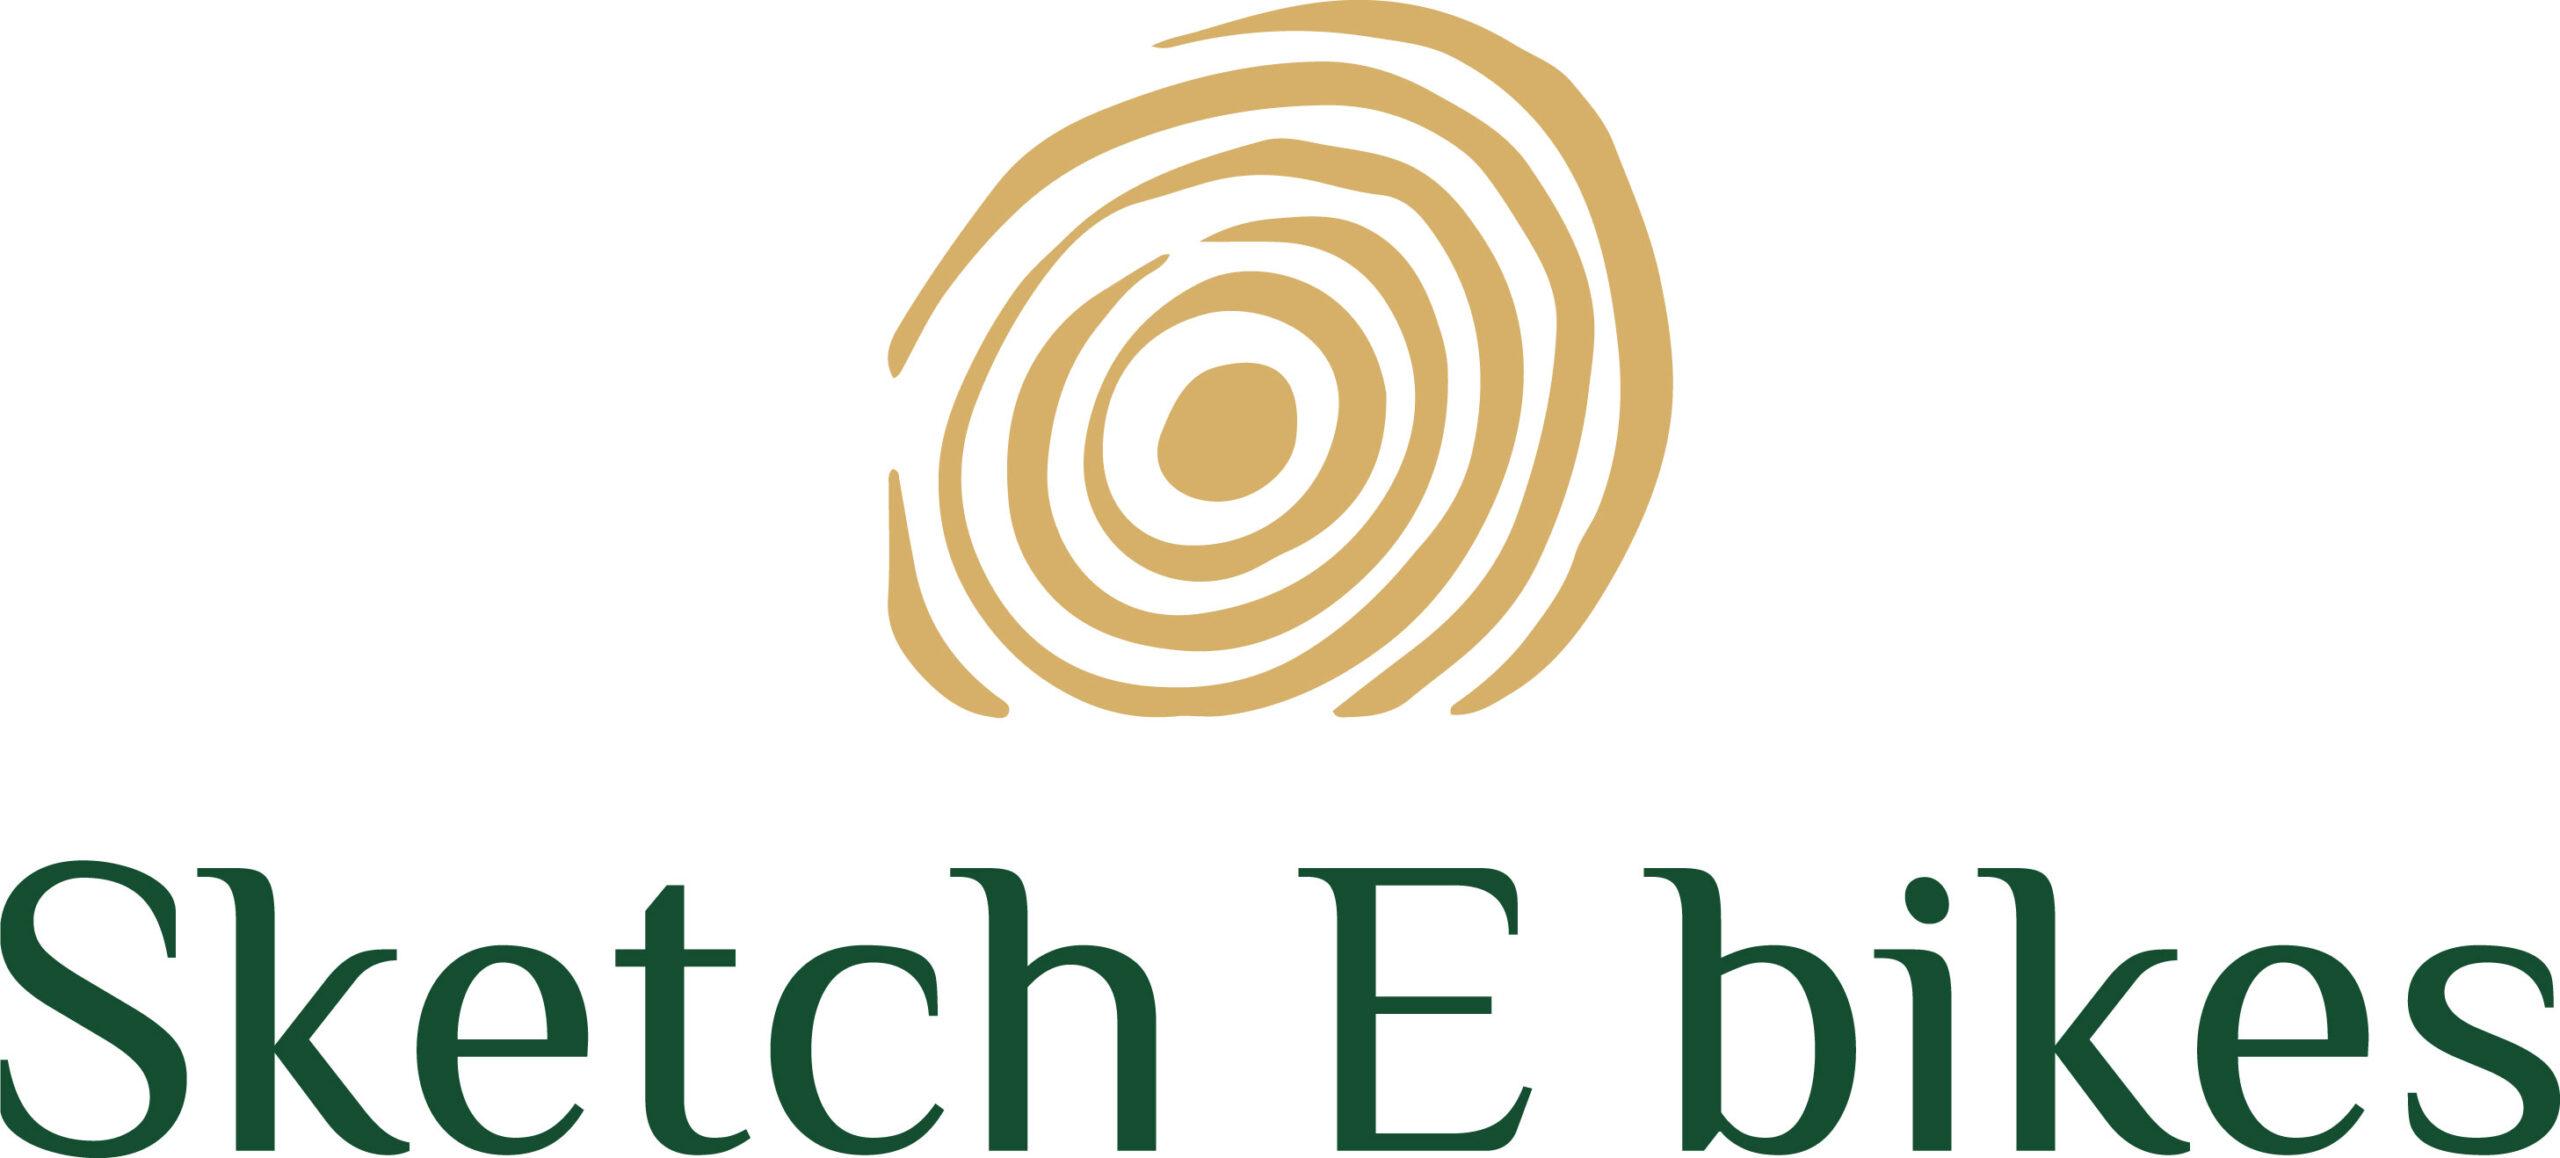 Sketch-ebike-logo